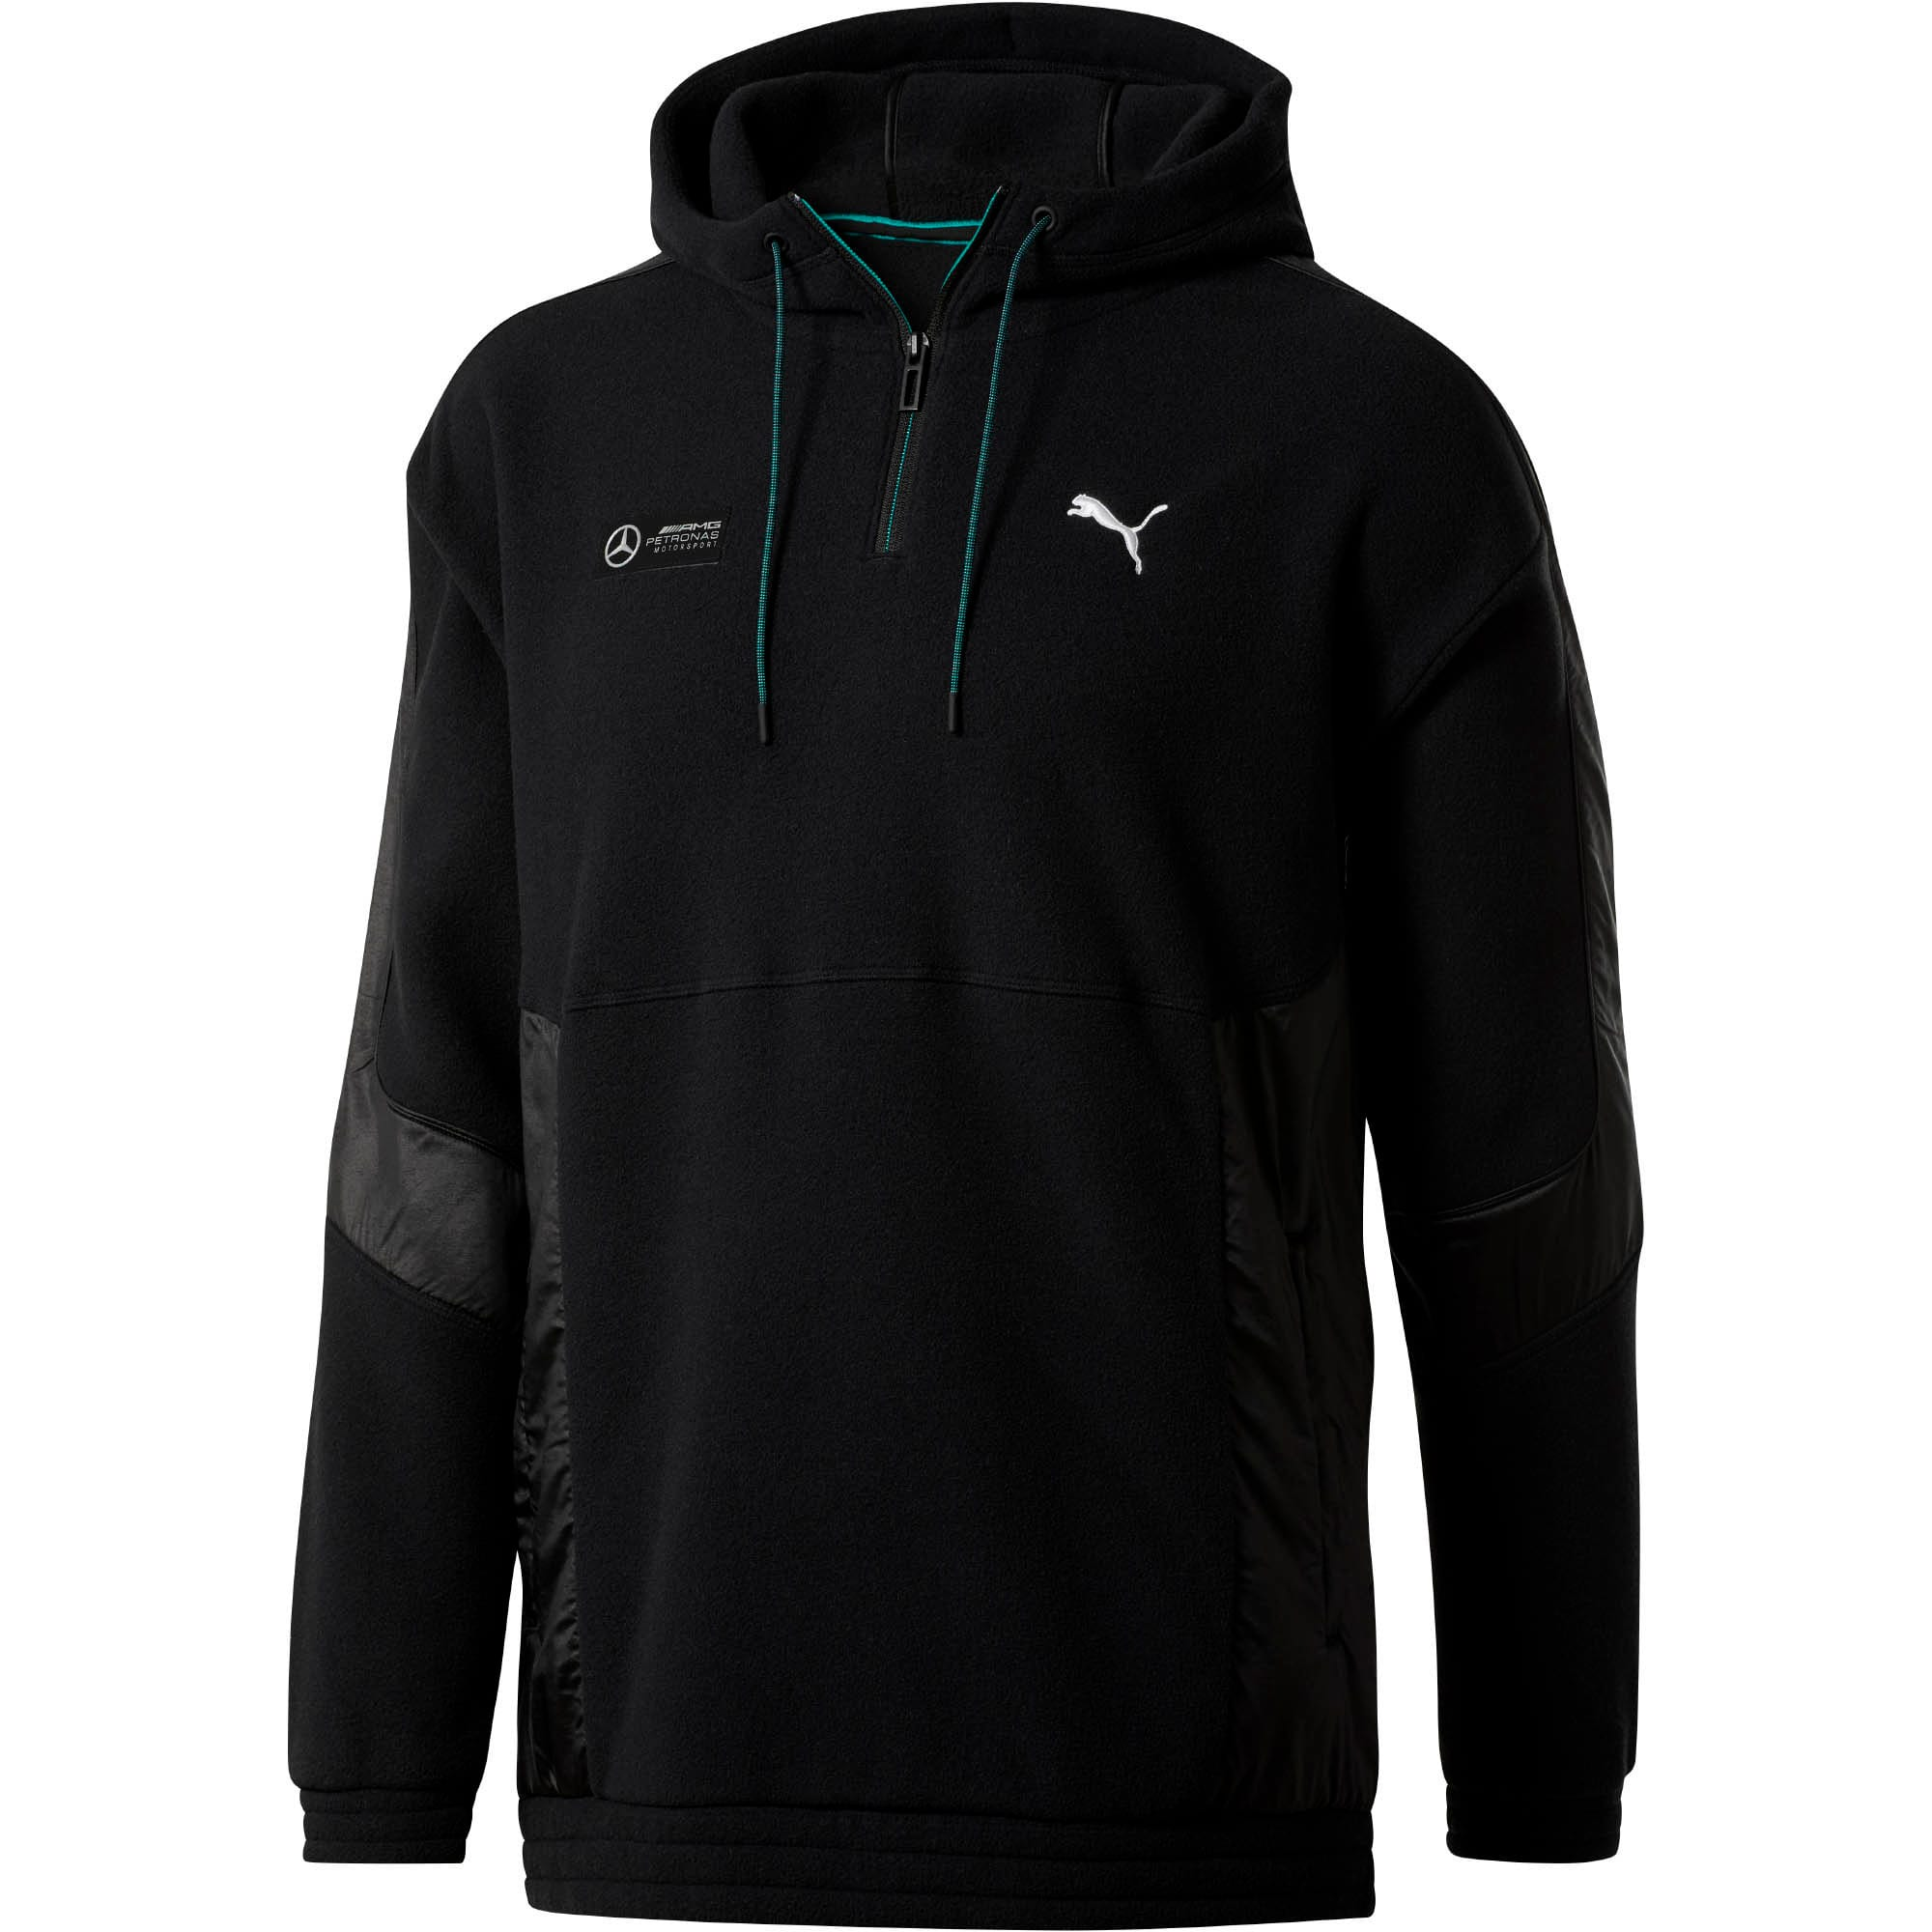 Thumbnail 1 of Mercedes AMG Petronas RCT Tech Men's Fleece Quarter Zip, Puma Black, medium